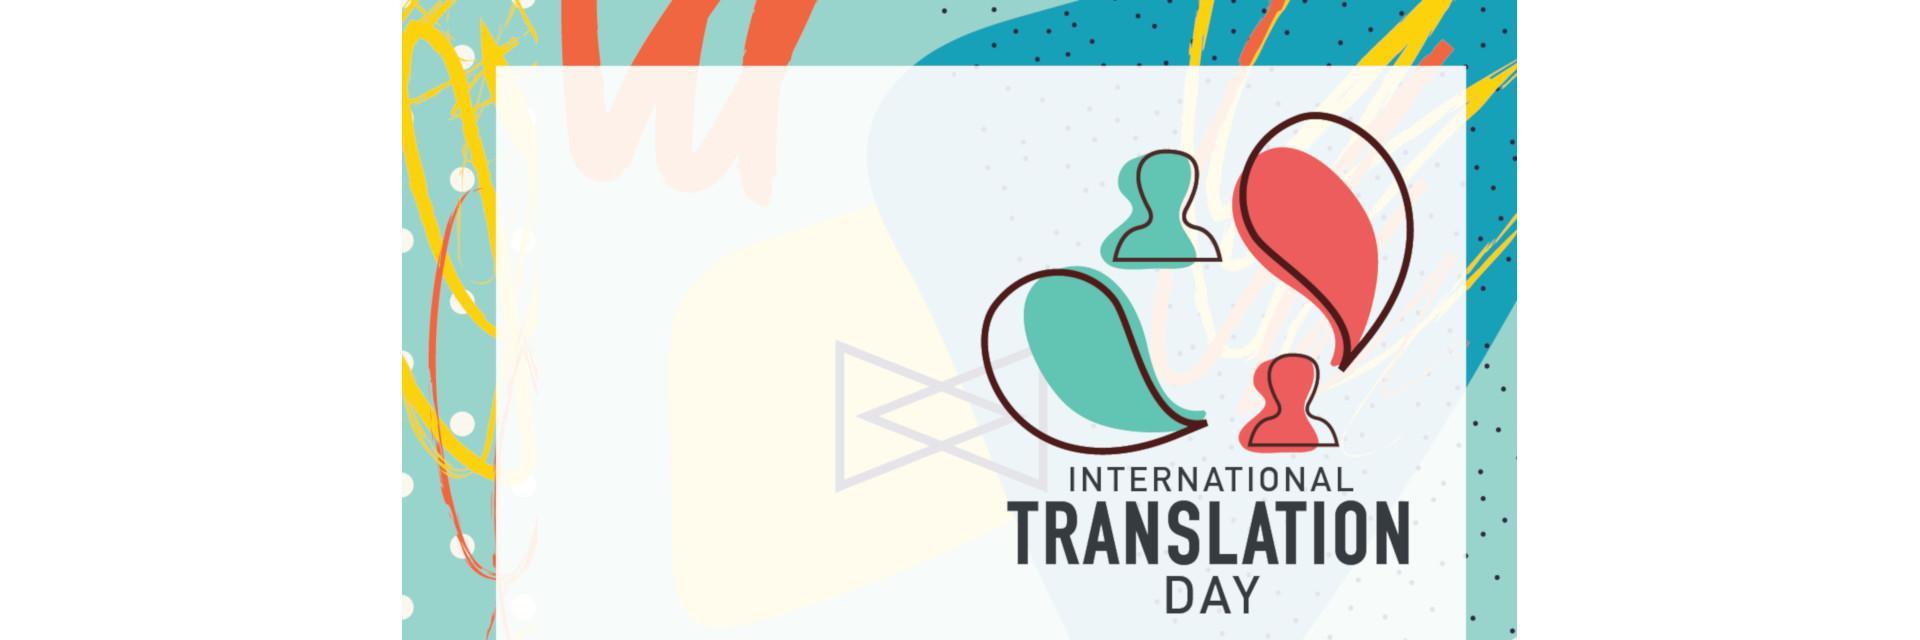 ECA celebrates international translation day 2021.